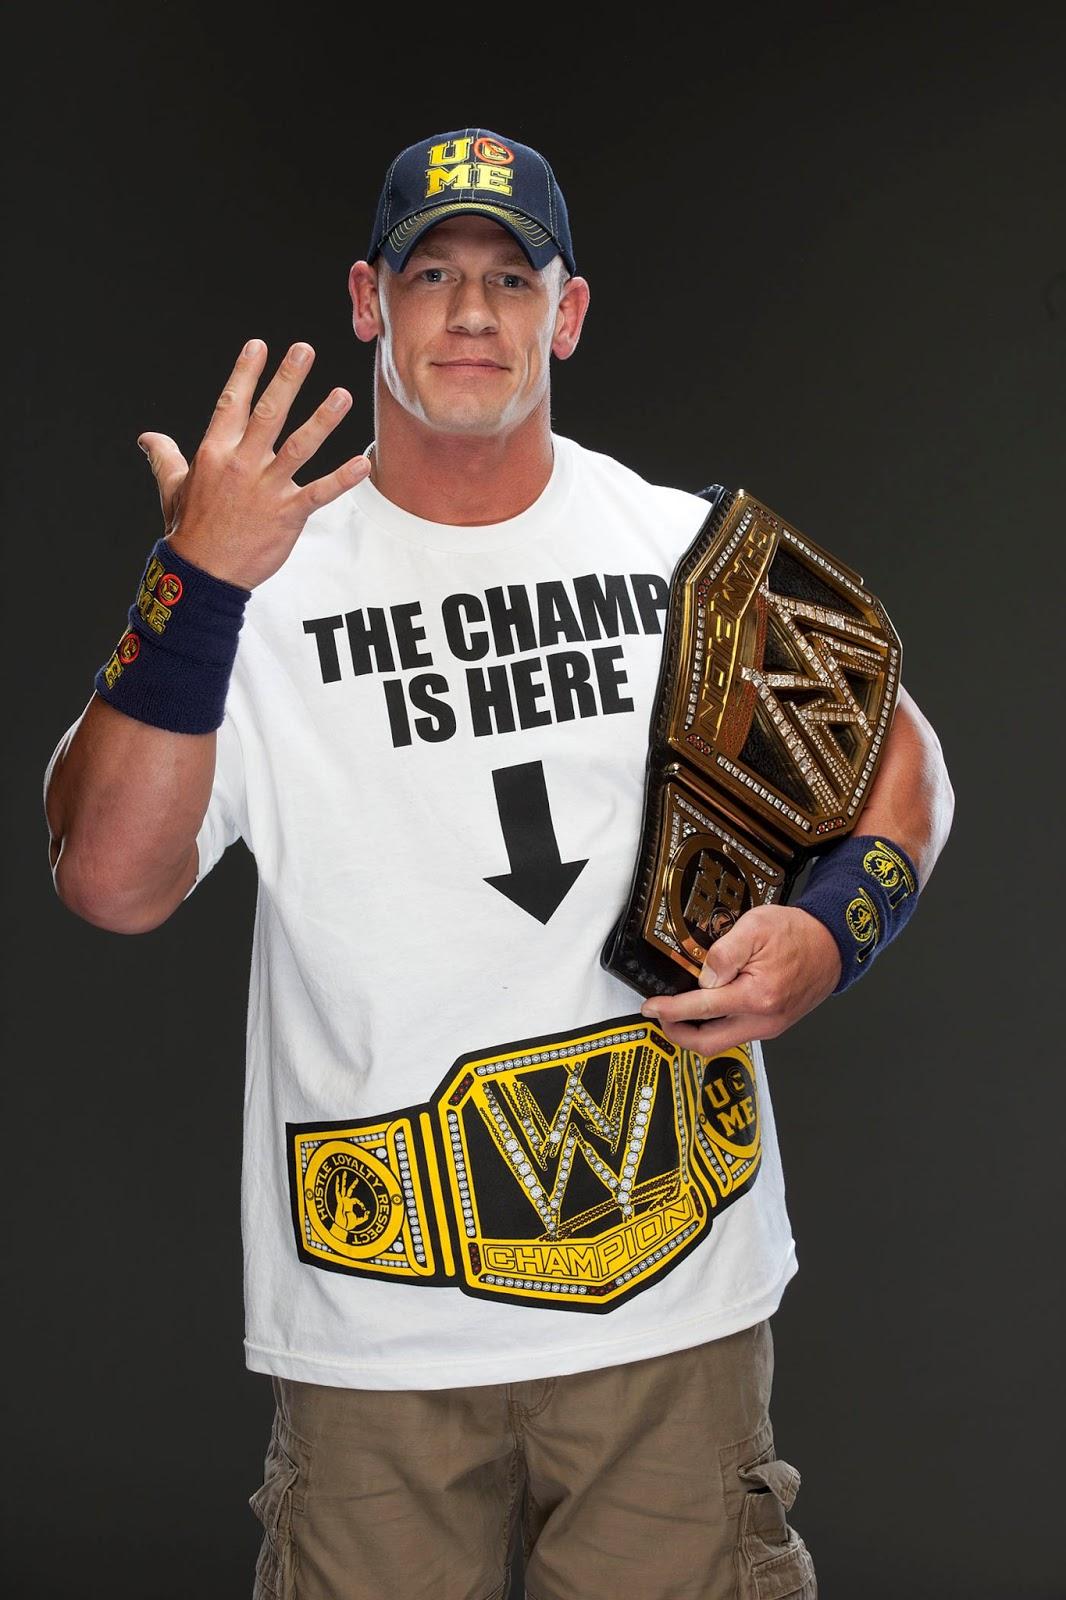 WWE132KTALKSJohn Cena Wwe Champion 2013 Champ Is Here